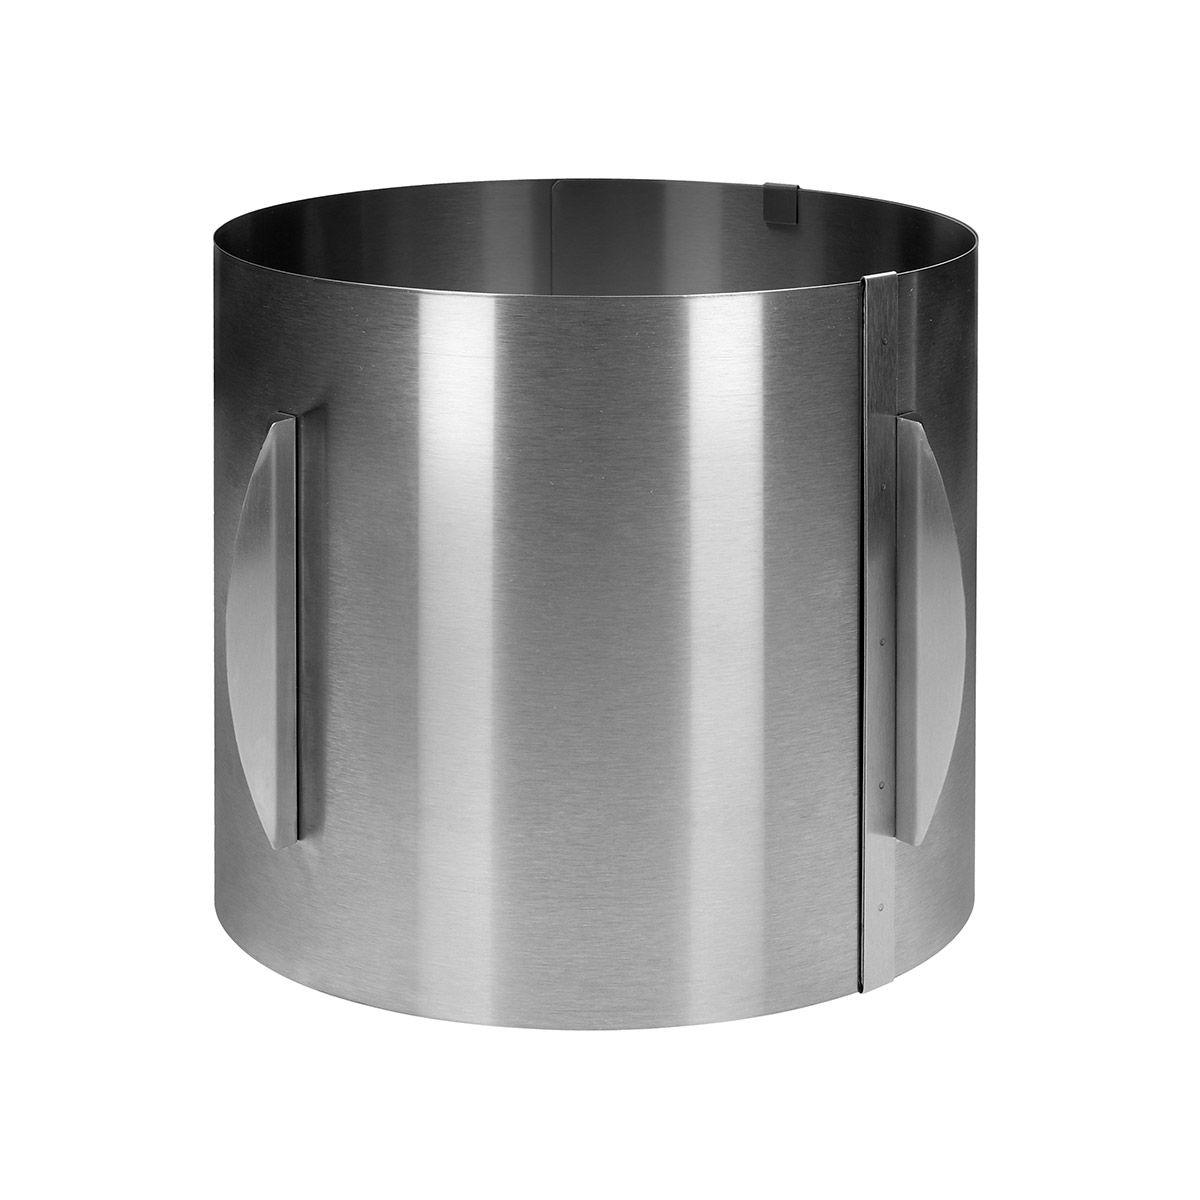 Imagen de producto: https://tienda.postreadiccion.com/img/articulos/secundarias14110-molde-ajustable-18-32-cm-diametro-20-cm-altura-1.jpg